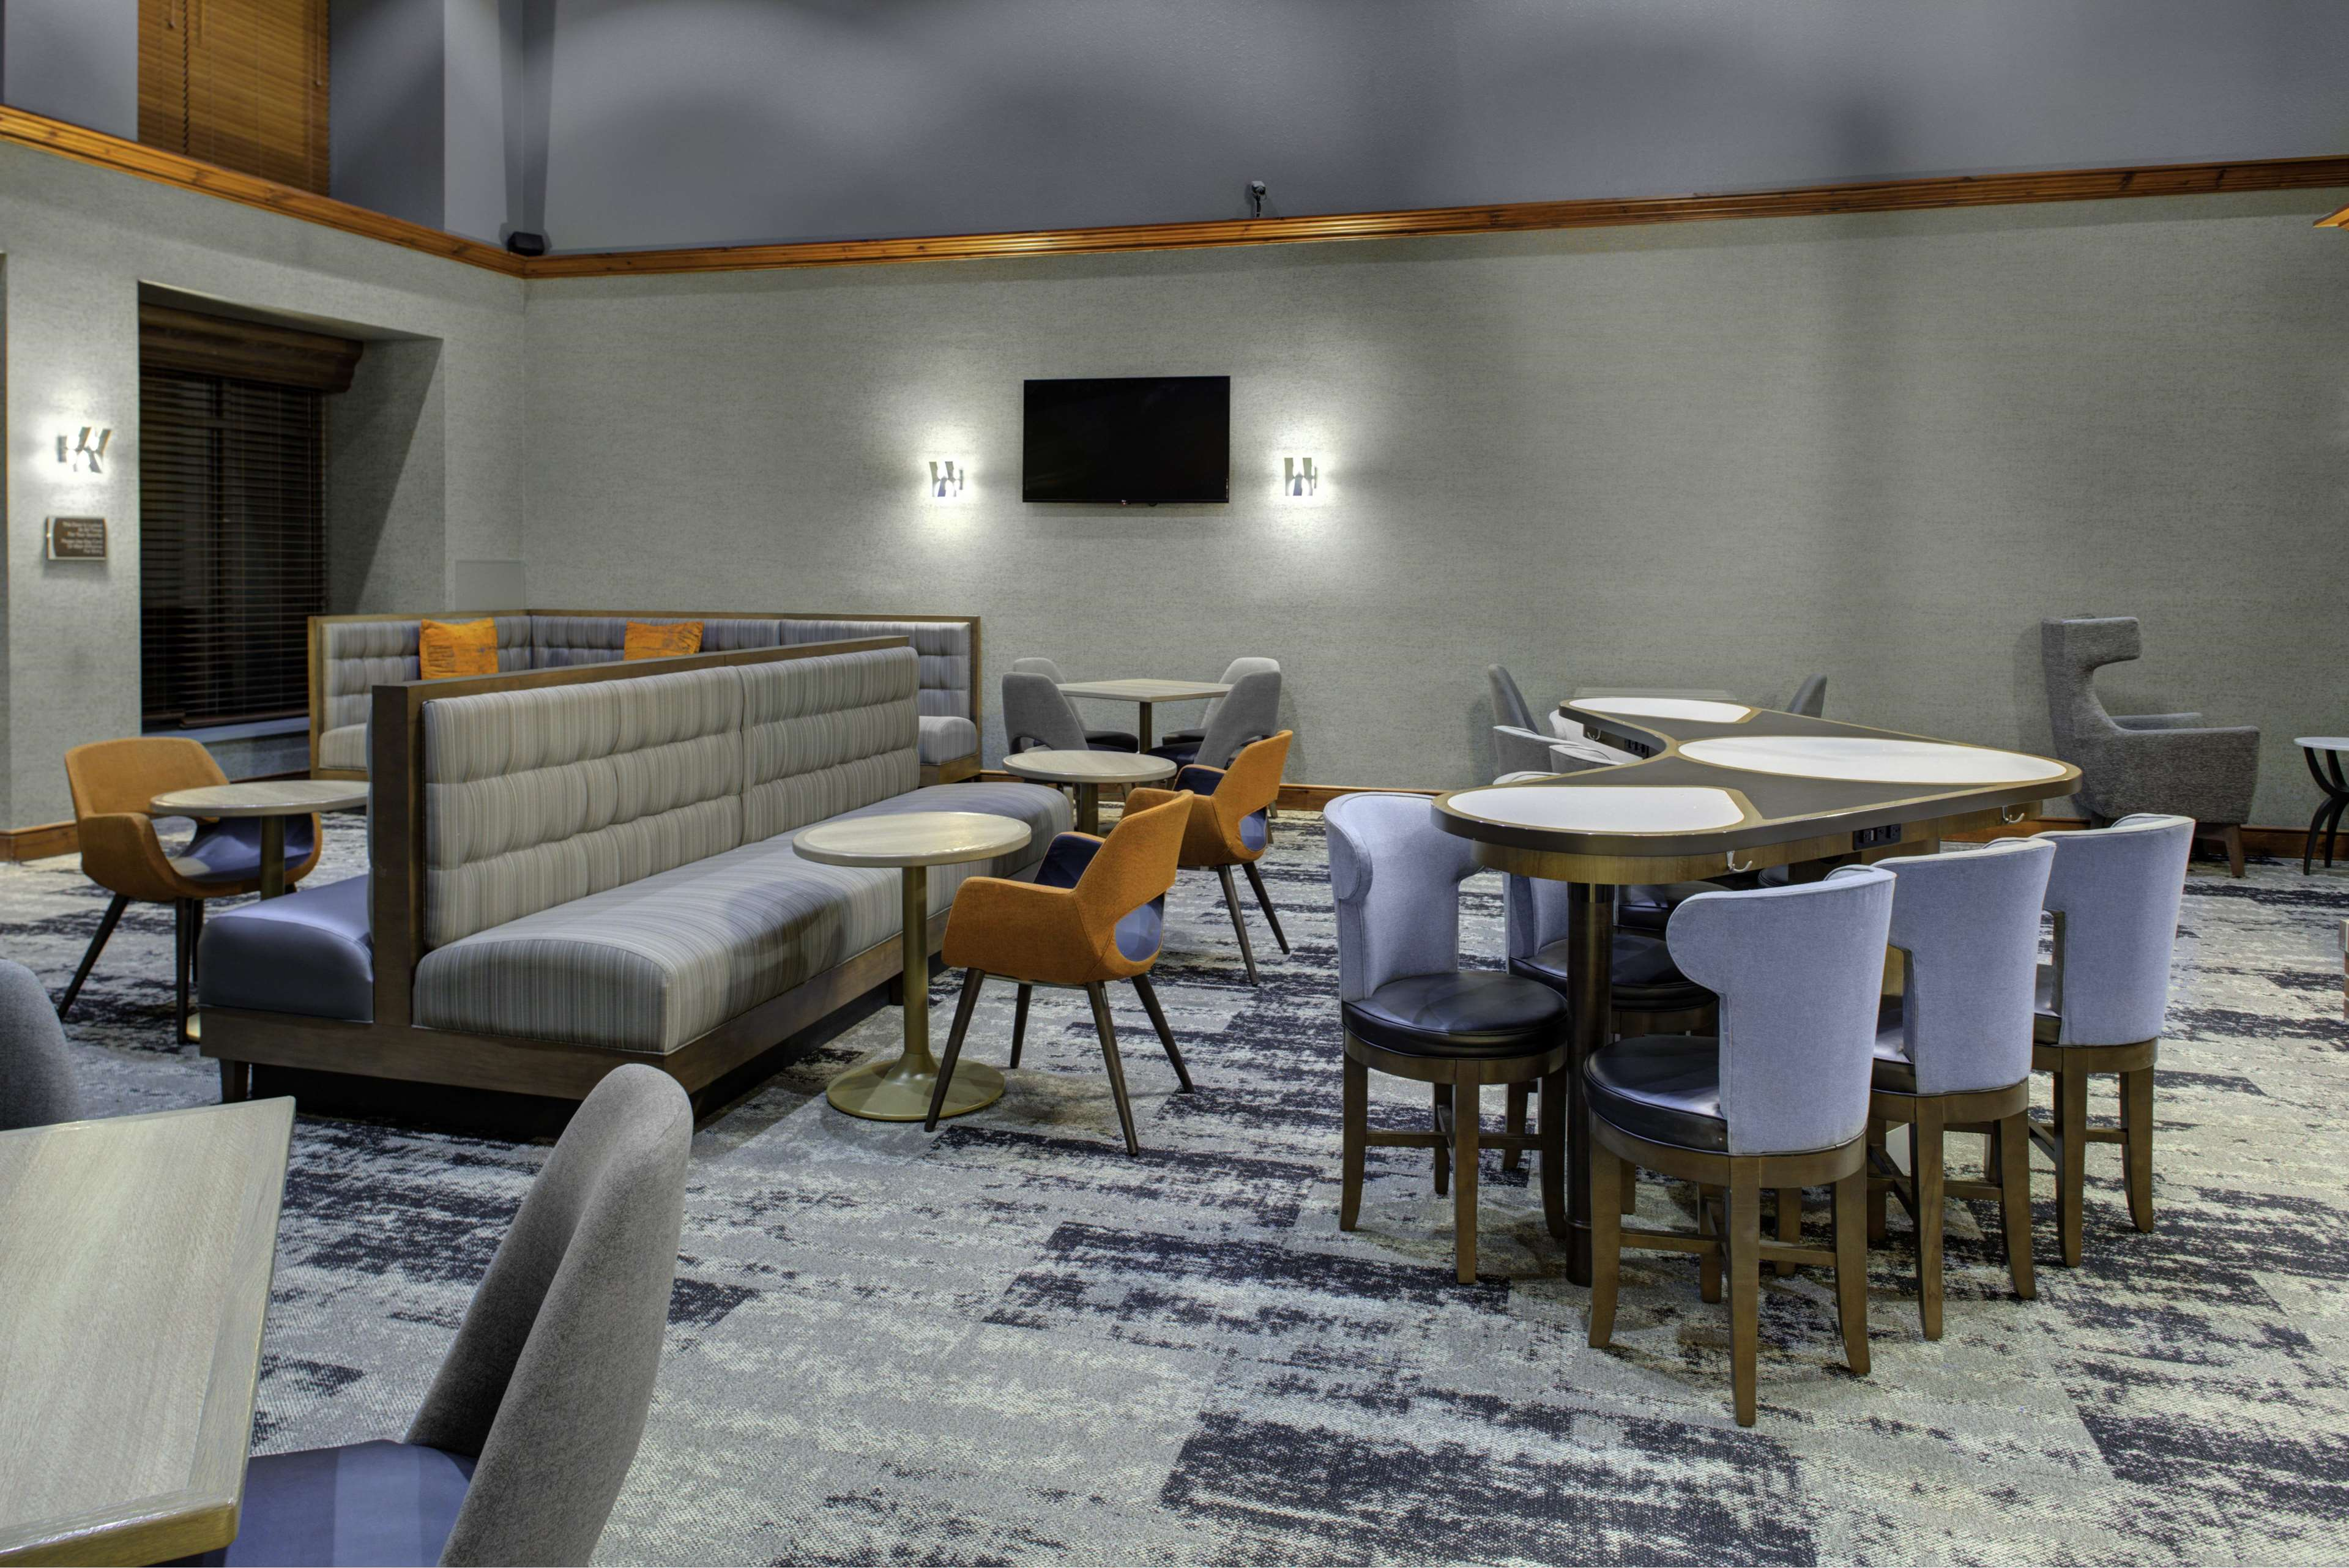 Homewood Suites by Hilton Richmond-West End/Innsbrook image 4